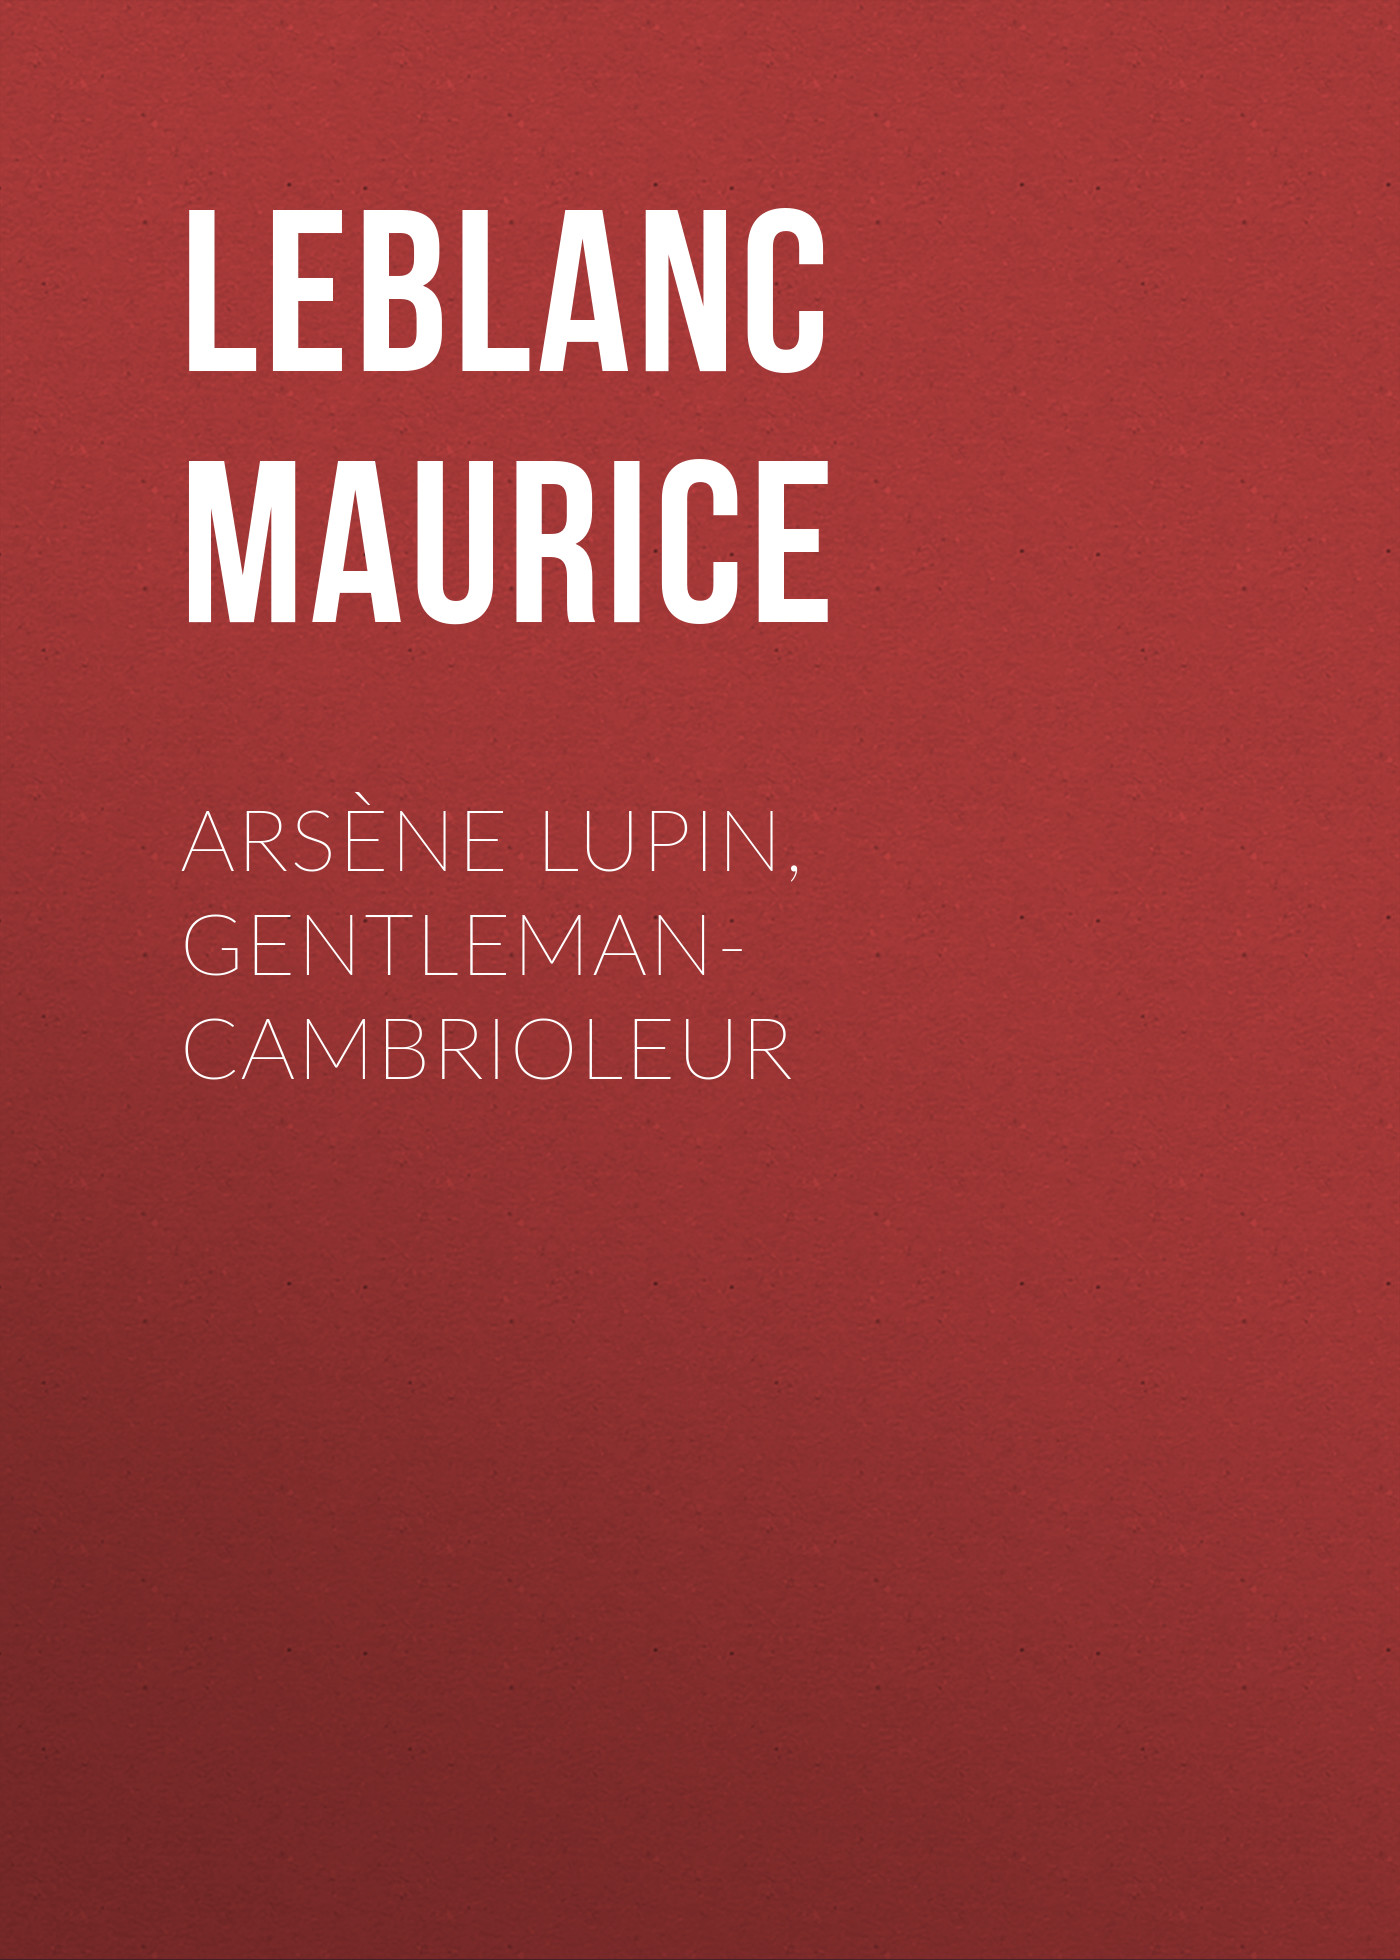 лучшая цена Leblanc Maurice Arsène Lupin, gentleman-cambrioleur